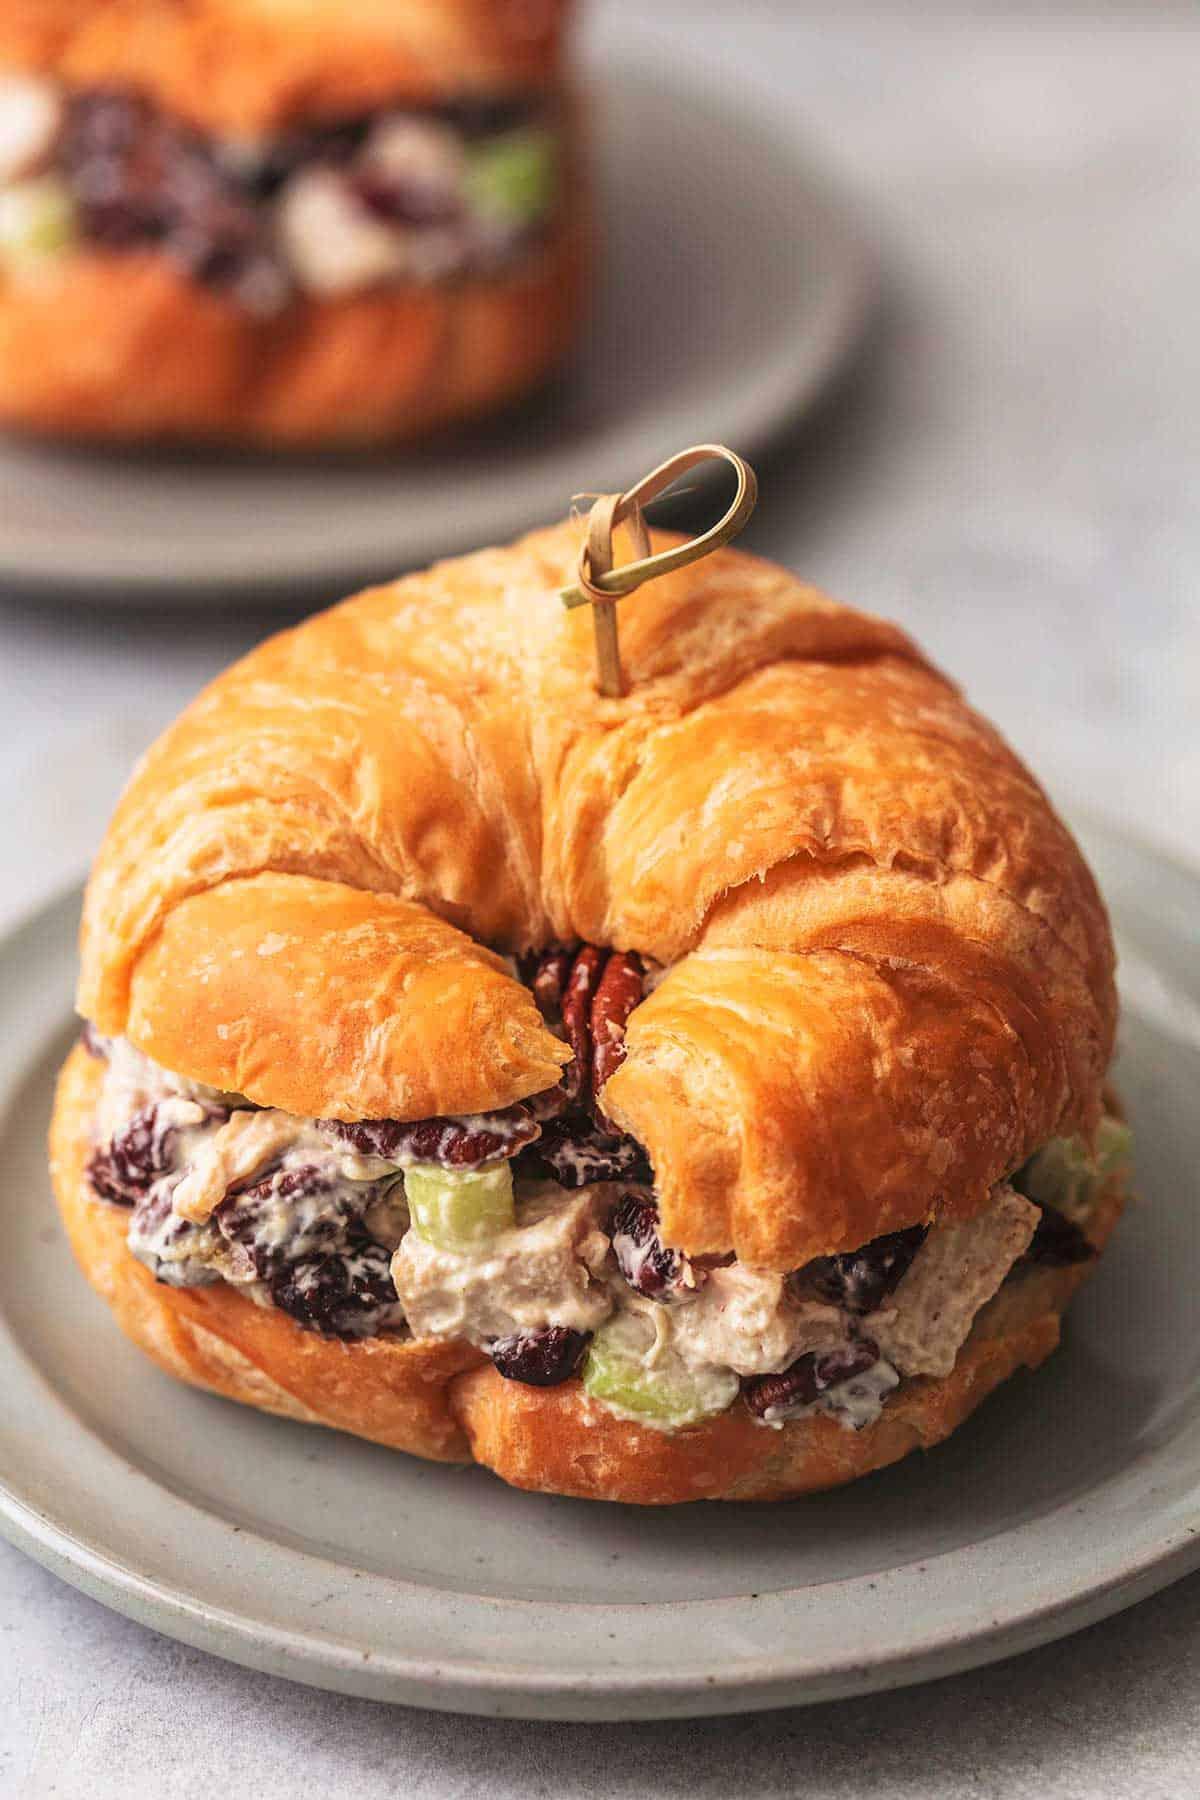 a cranberry pecan turkey salad croissant sandwich on a plate.